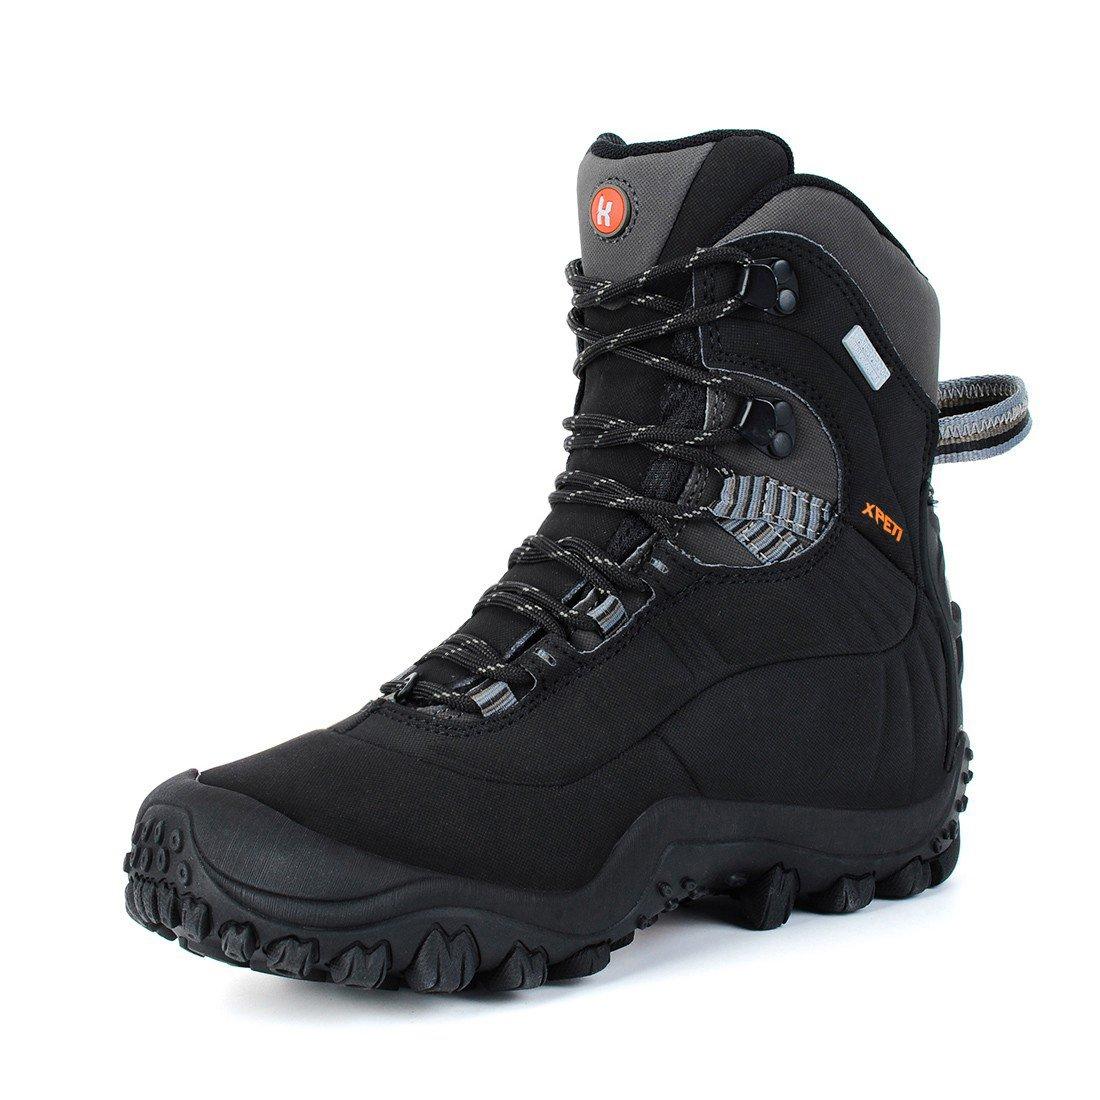 Manfen Women's Mid-Rise Waterproof Hiking Boot US 8